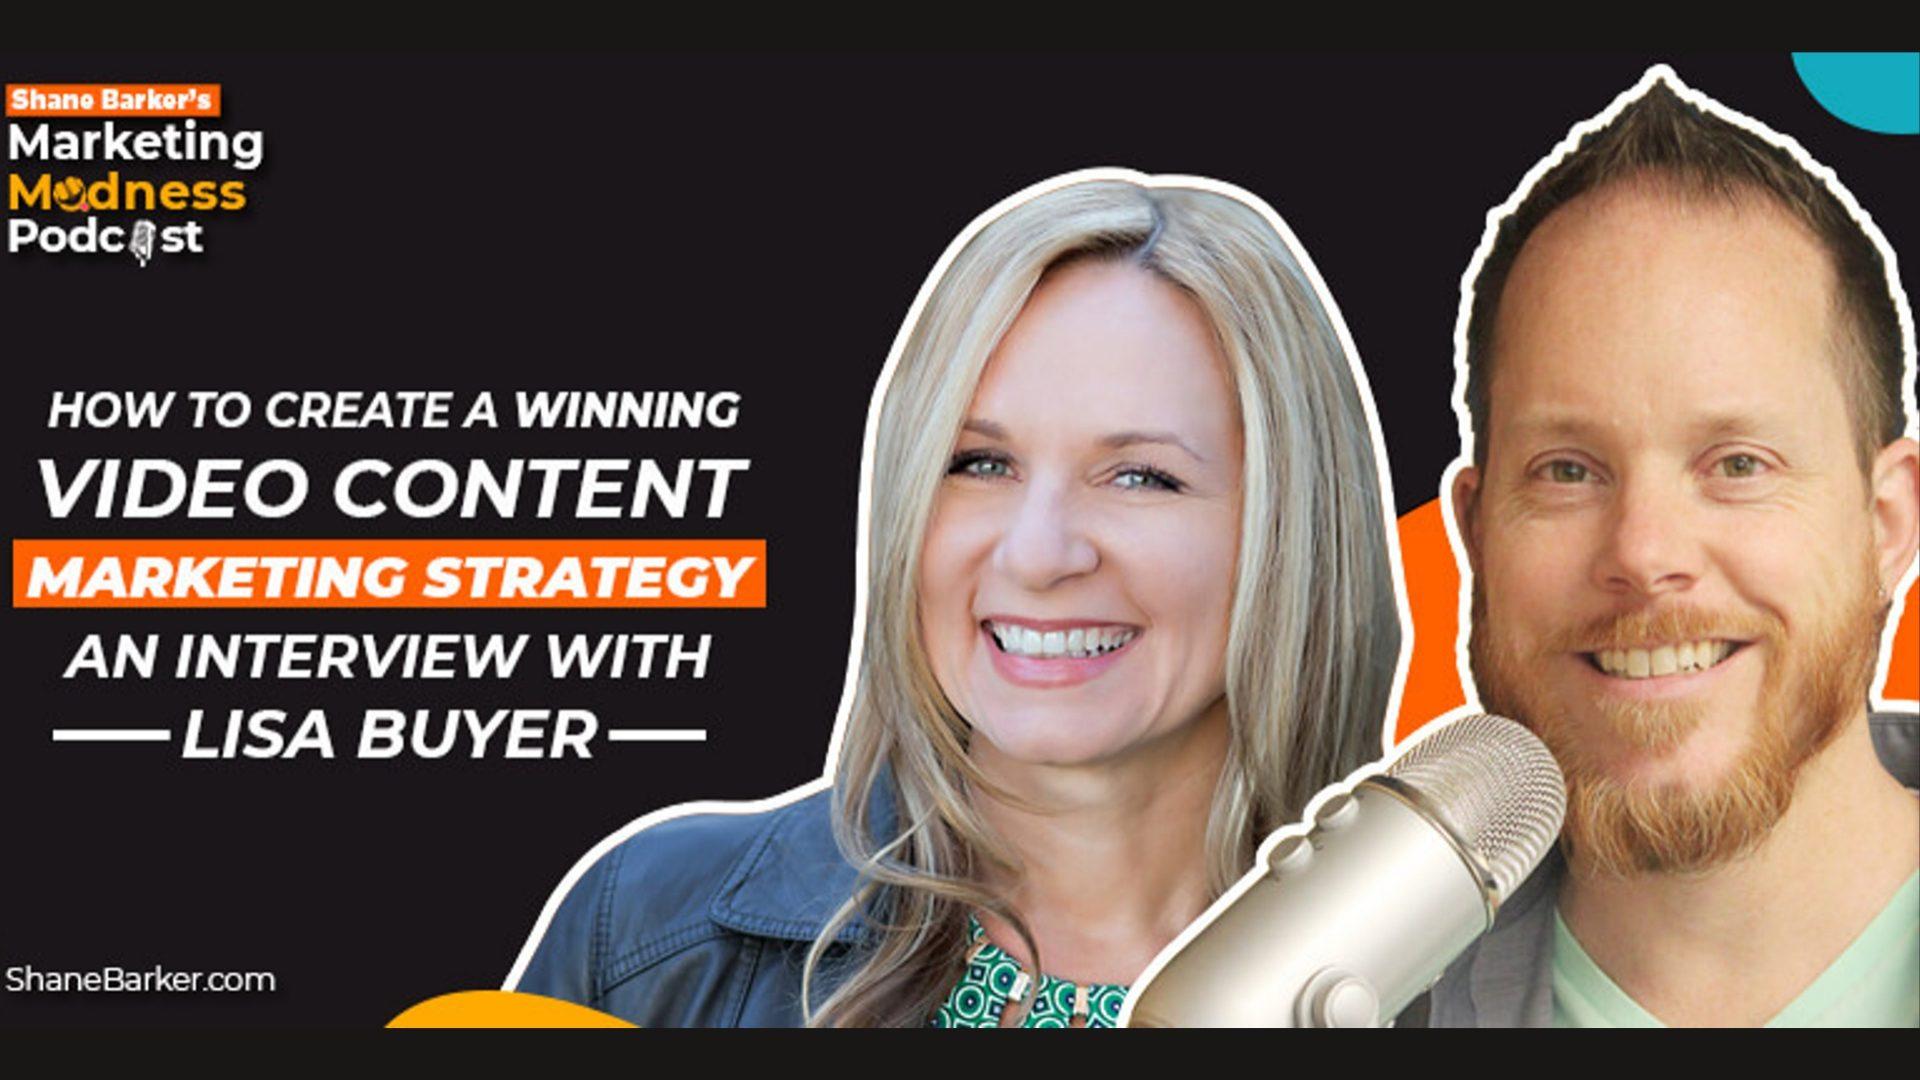 PR Disruptor Lisa Buyer Talks Marketing Madness with Shane Barker